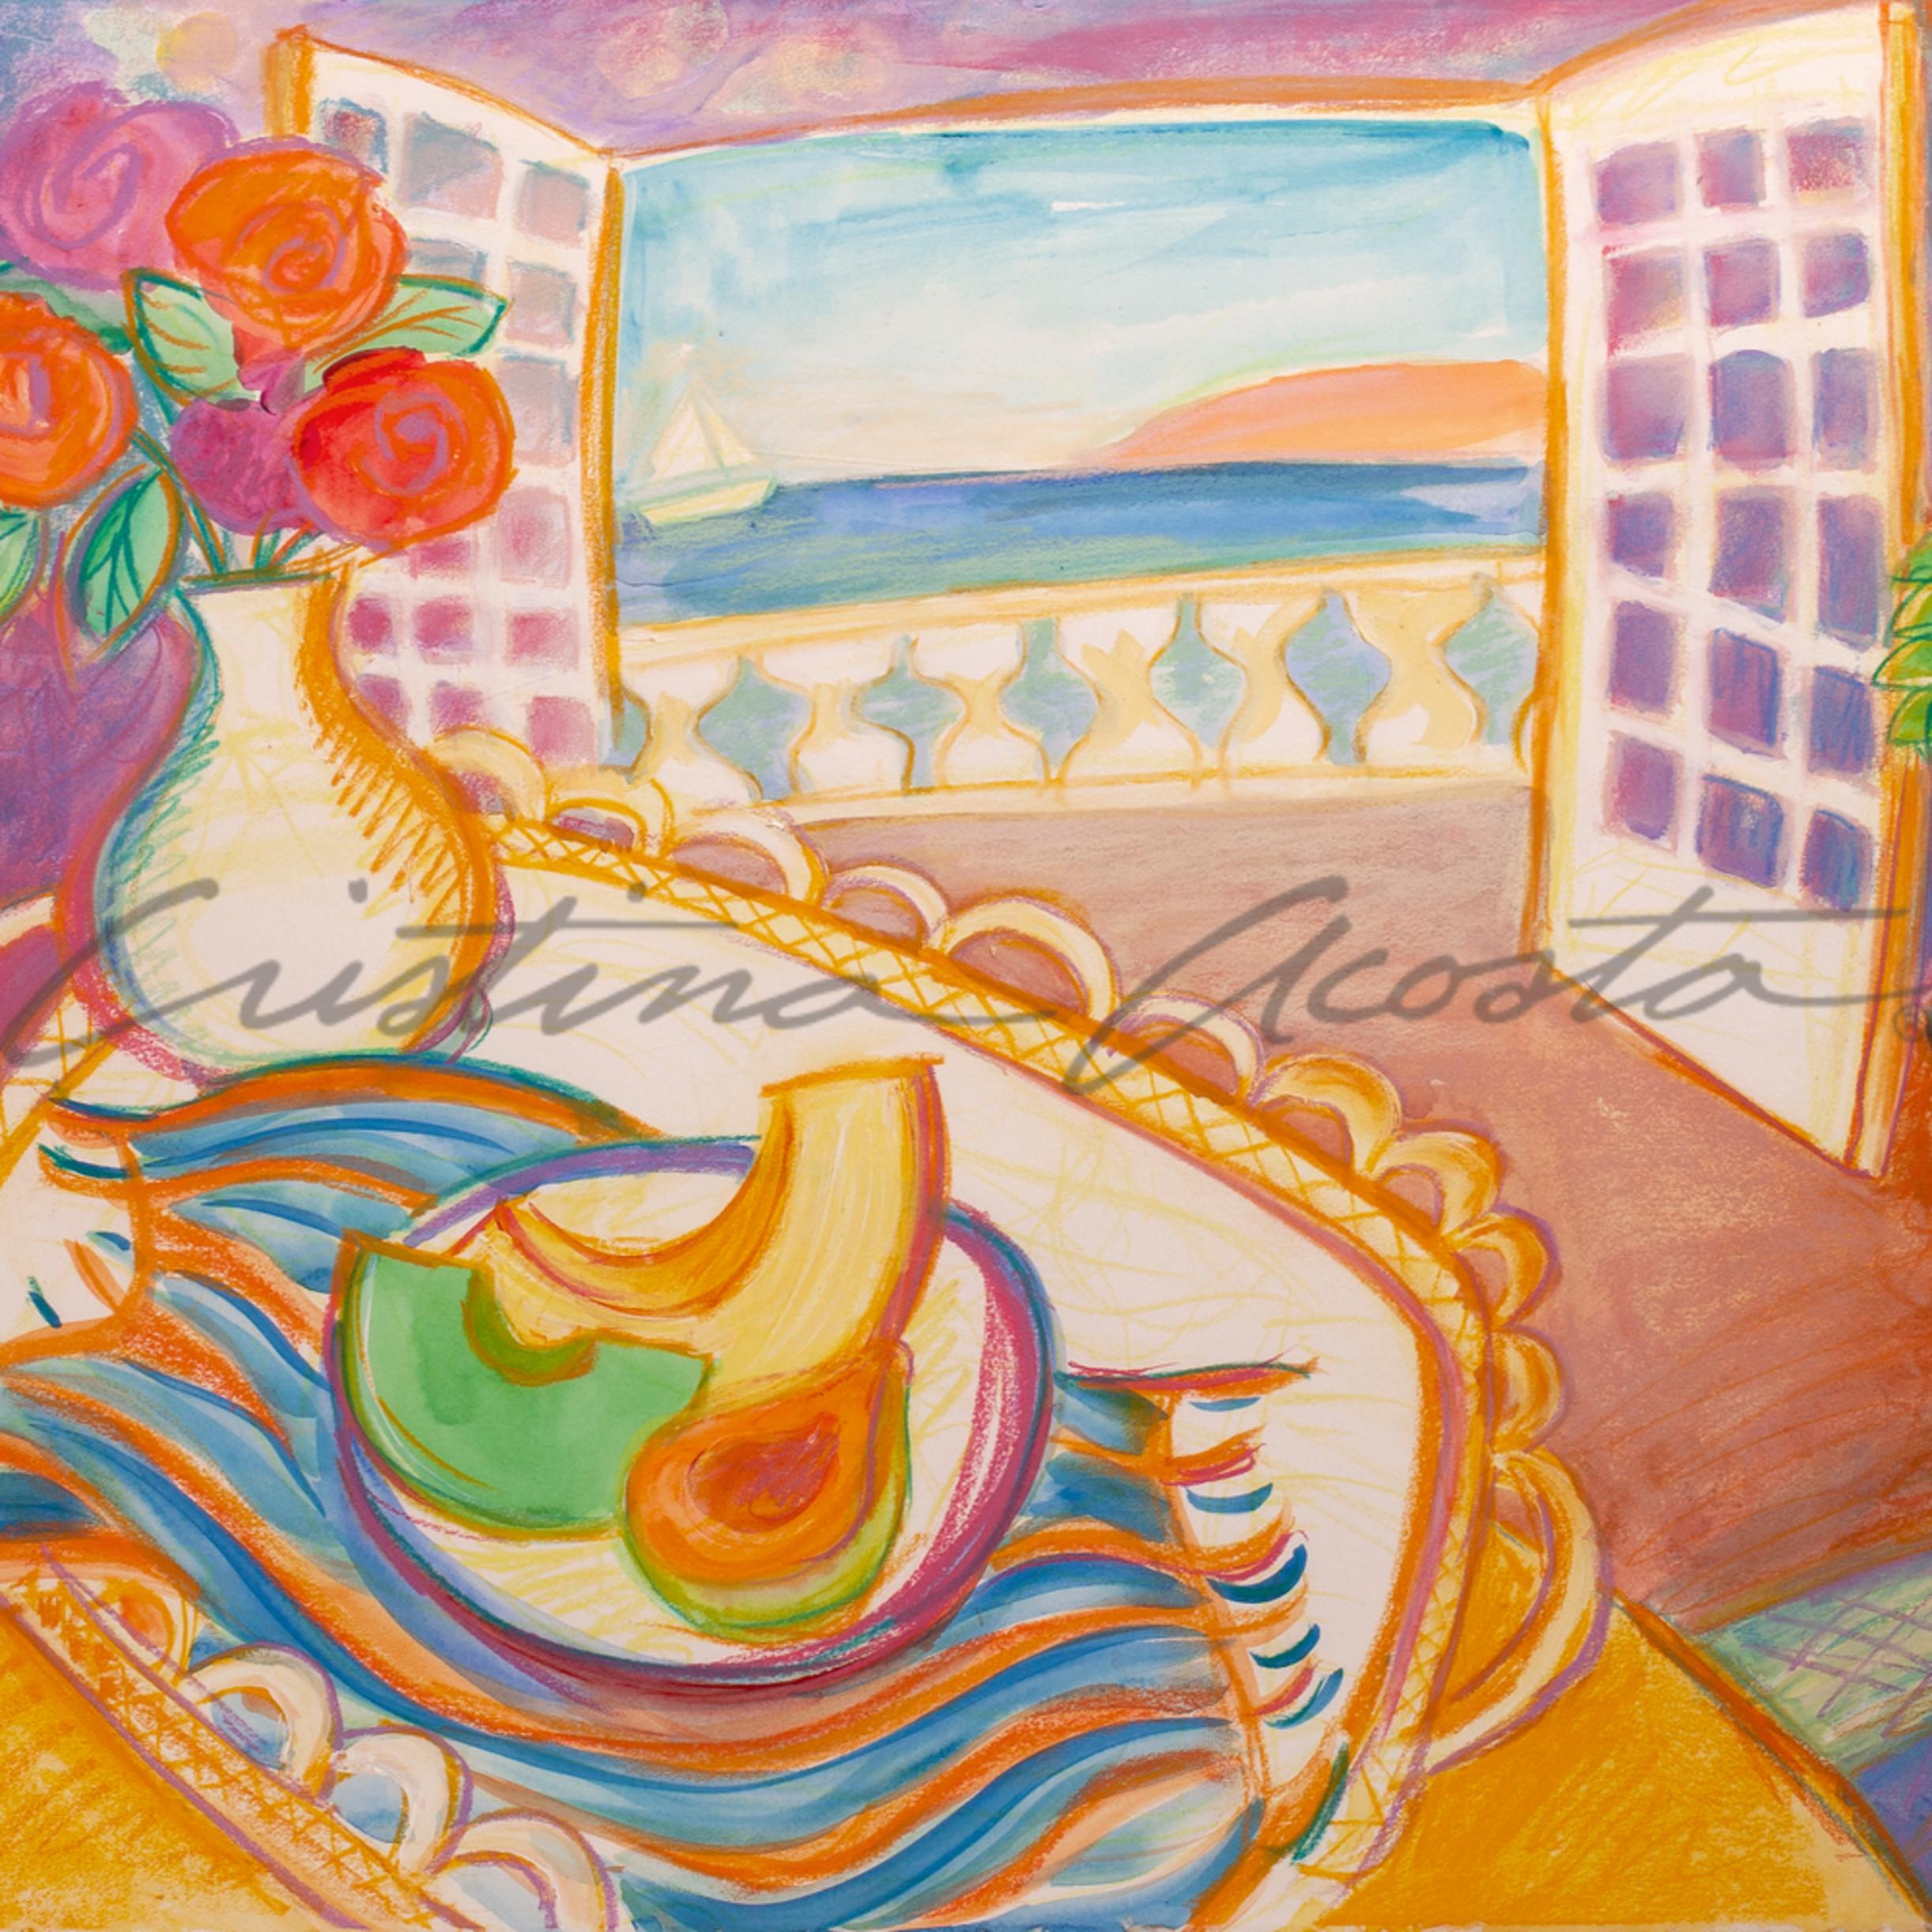 Seaside breakfast paint happy cristina acosta 2020 oyl0c2